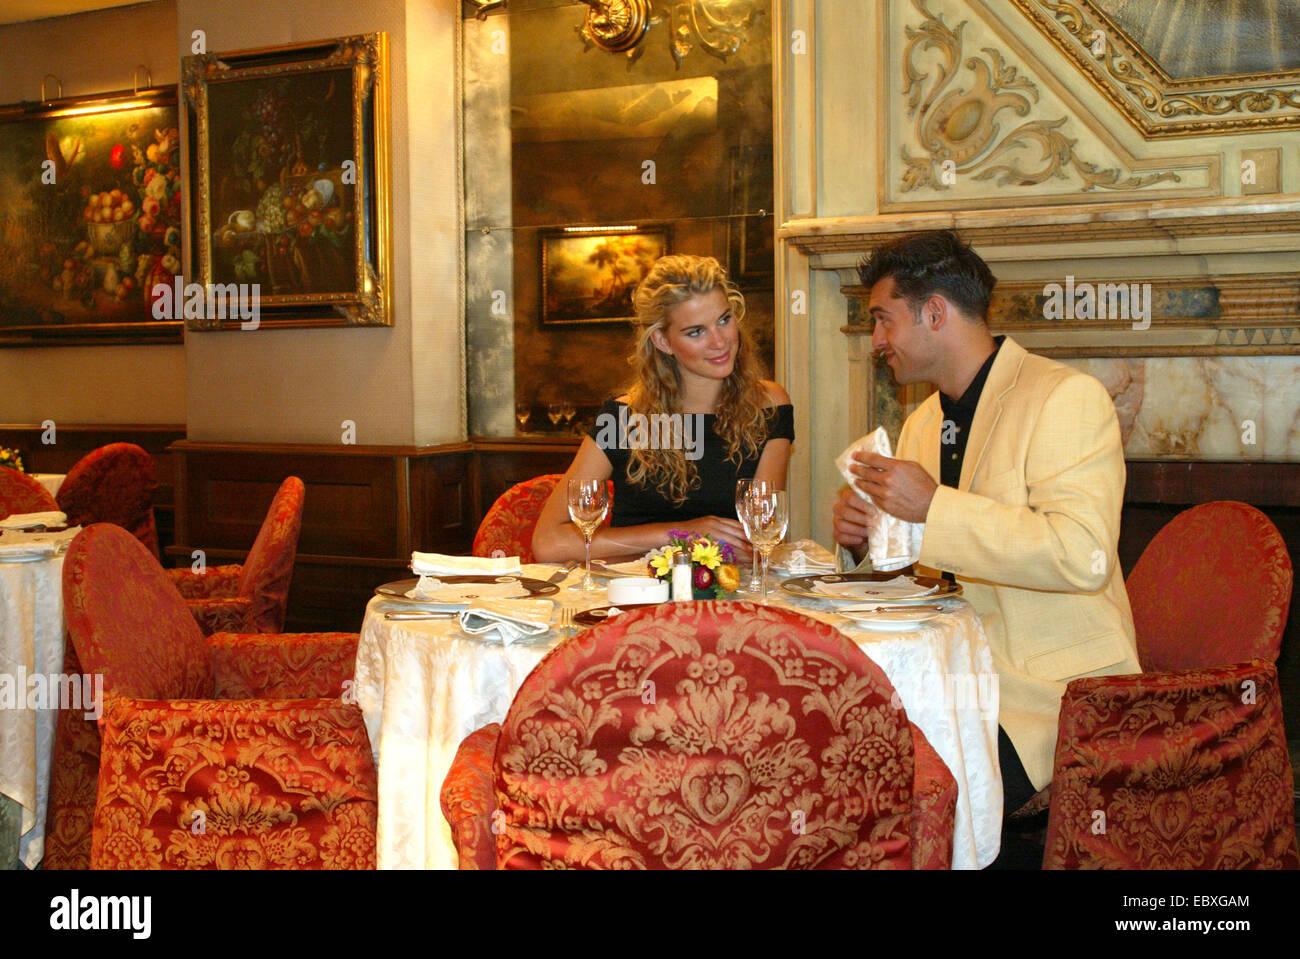 Paar in Harrys Bar, an der Via Veneto in Rom, Flirt, Gespraech, Dinner |  | BLWS119183.jpg [ (c) blickwinkel/K. - Stock Image